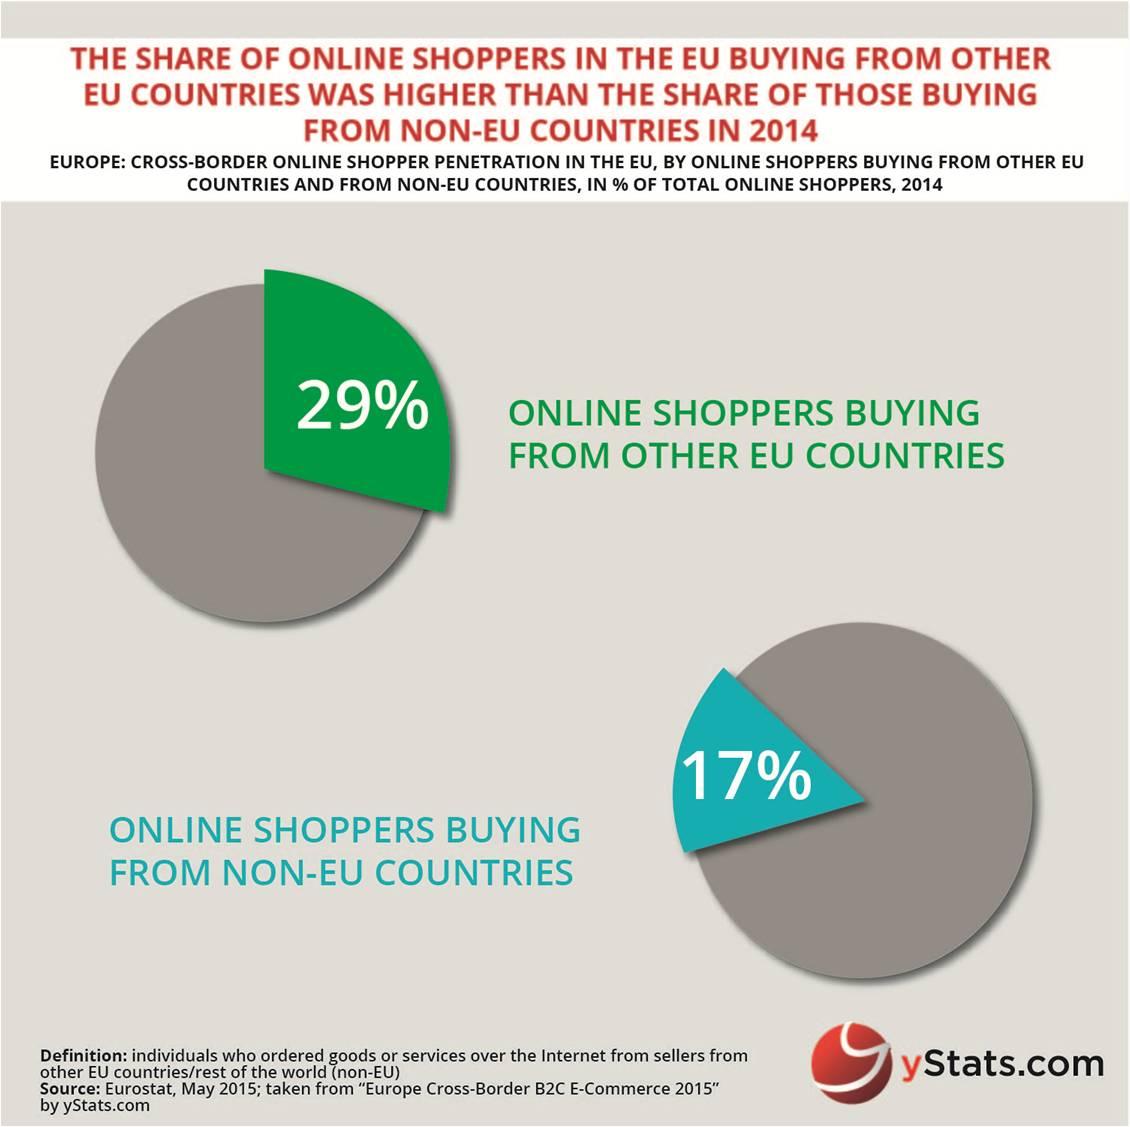 Internet shopping penetration in eu